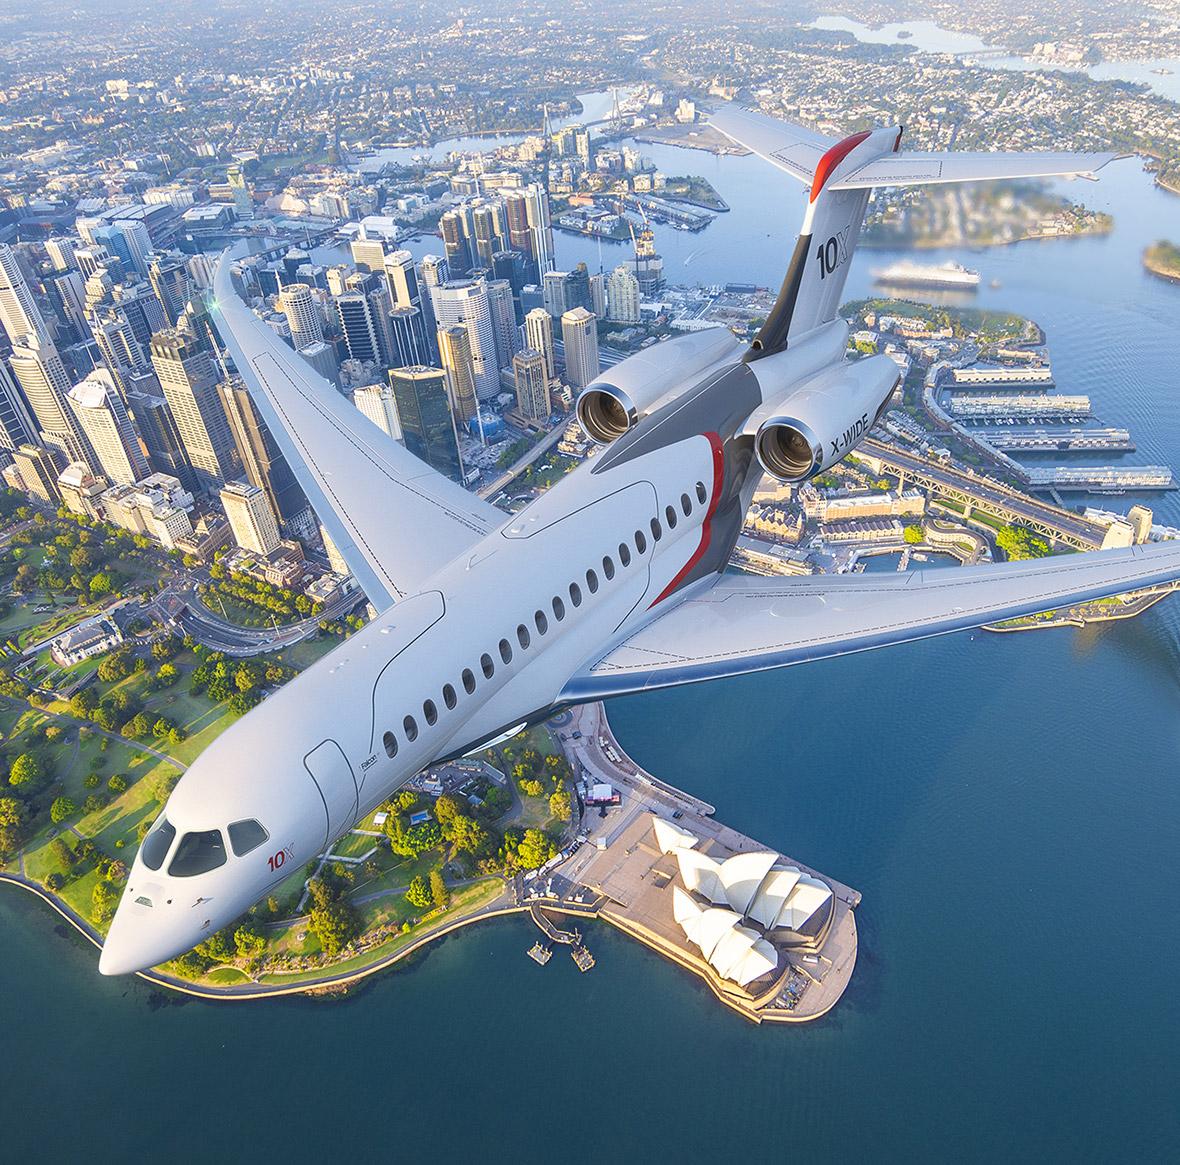 Dassault Aviation Falcon 10X Business Jet